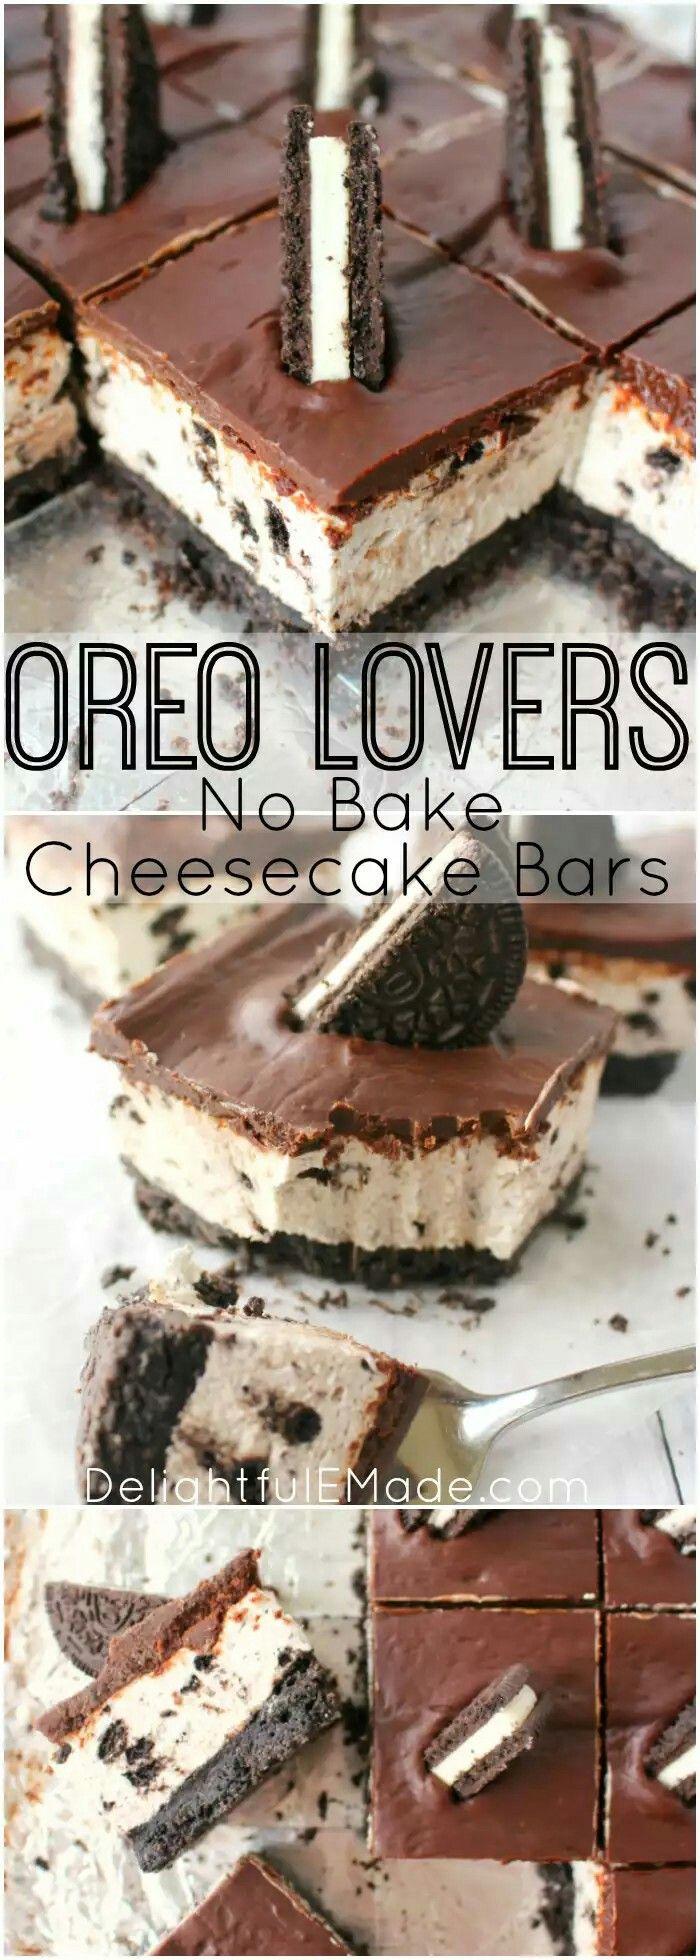 Oreo lovers no bake cheesecake bars